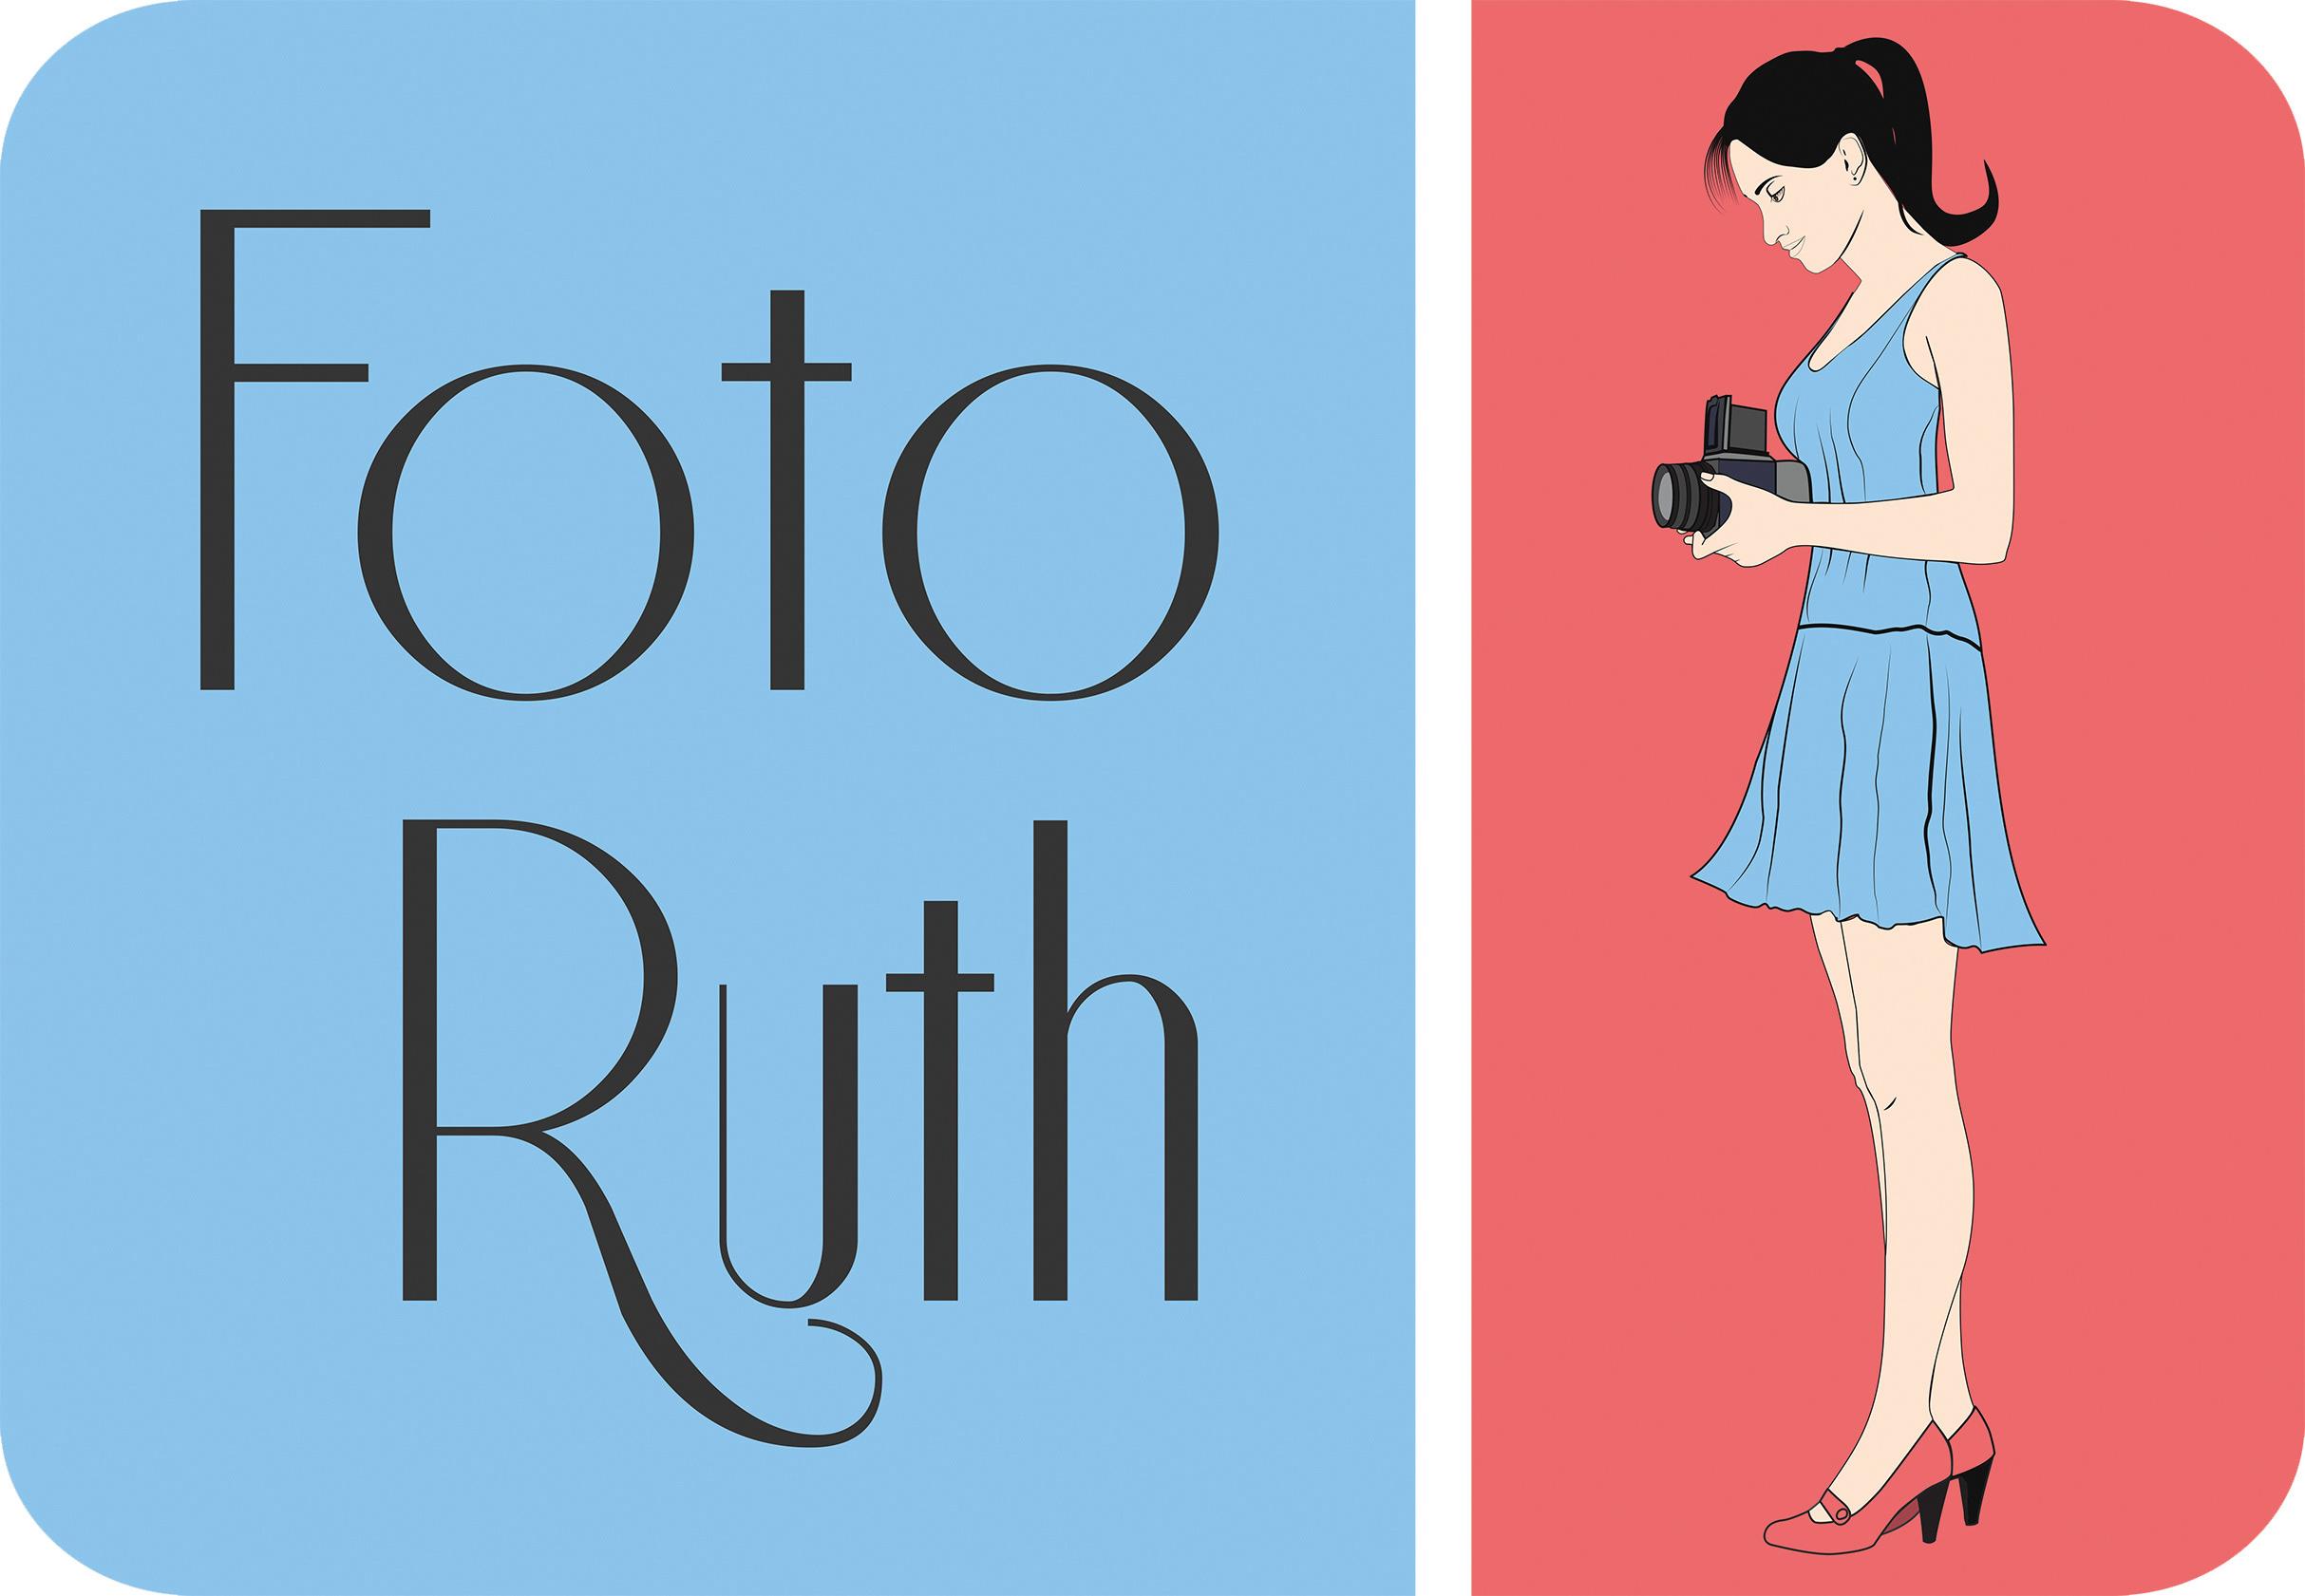 FOTO RUTH - Das Fotostudio im Stubai